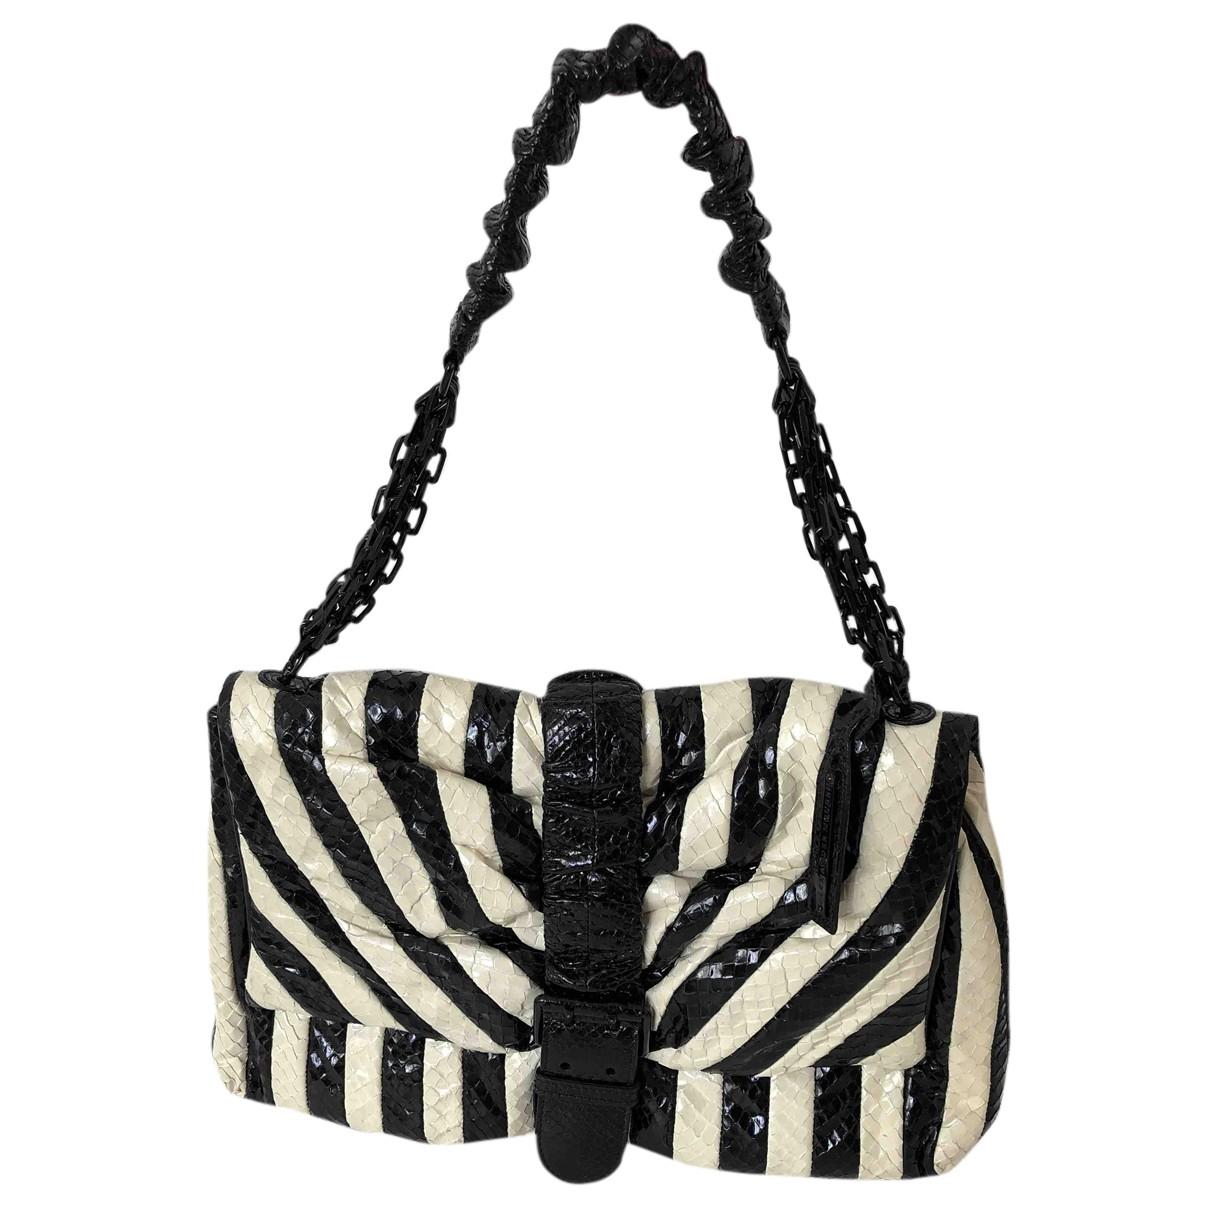 Alexander Mcqueen N Exotic leathers handbag for Women N